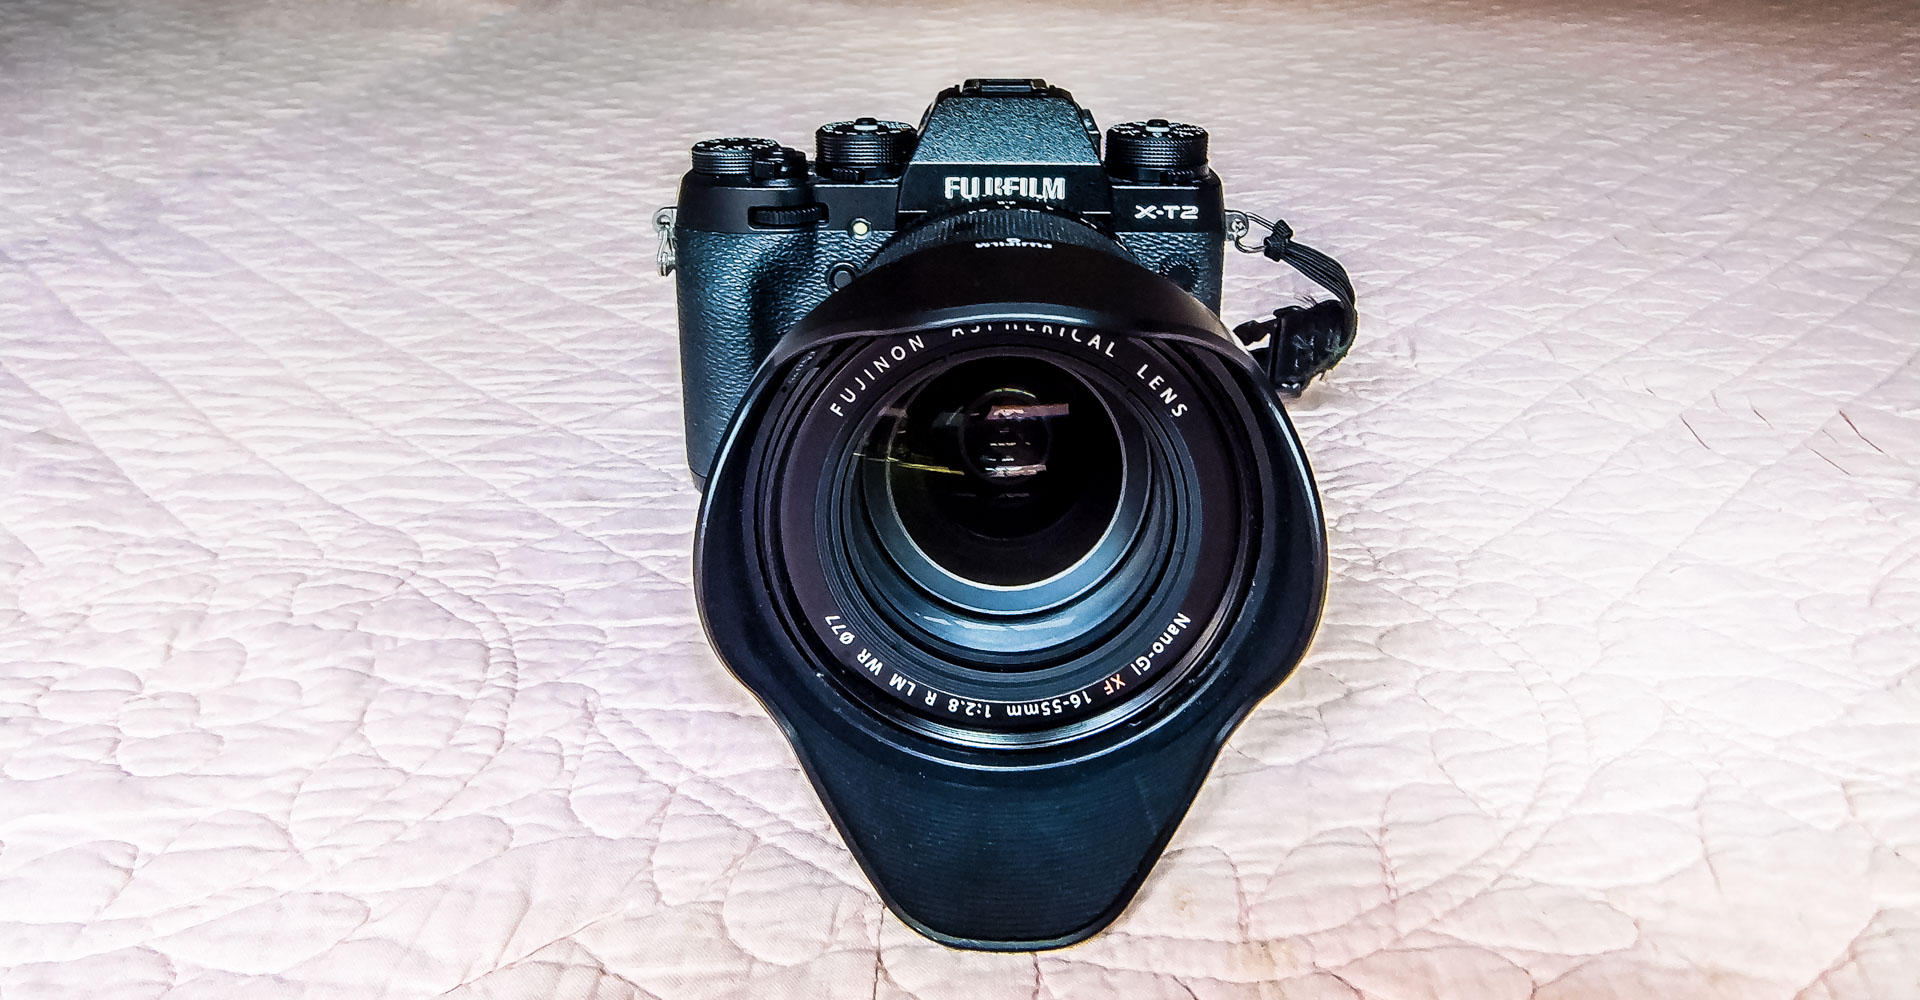 The Fujifilm X-T2